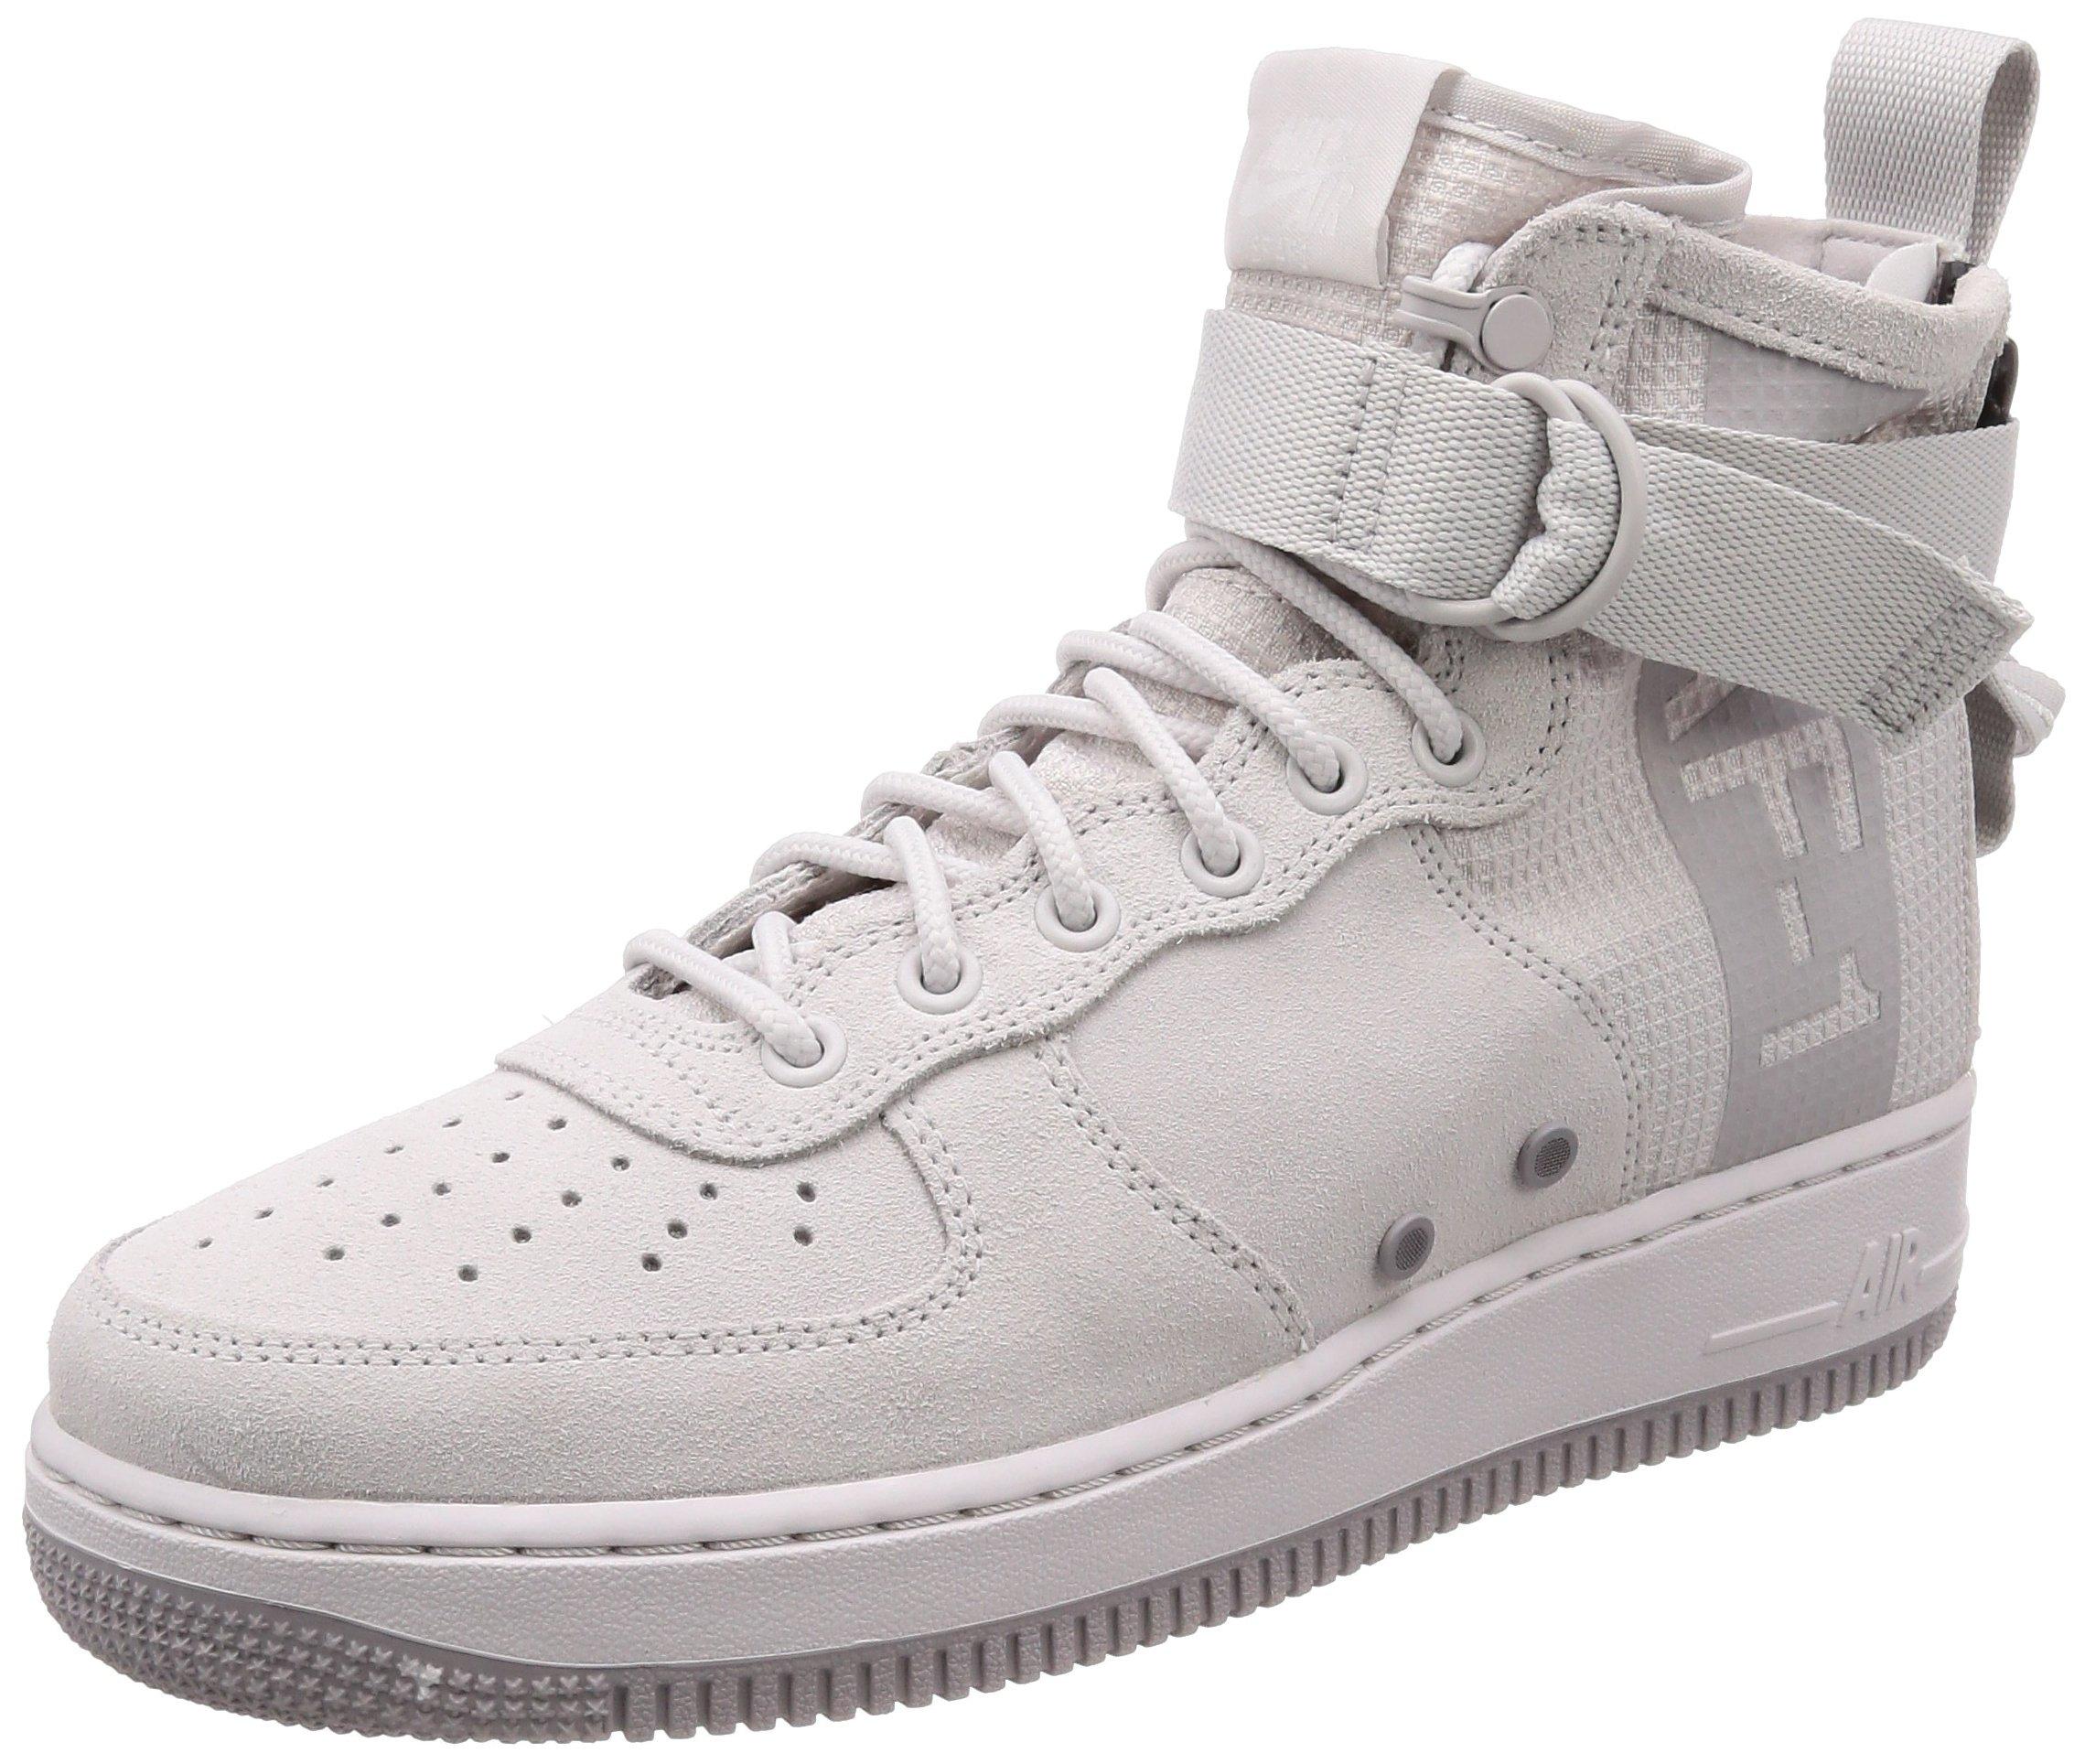 more photos 3b490 3baac Nike SF Air Force 1 Mid 17 Men's Shoes Vast Grey/Atmosphere Grey aj9502-001  (11.5 D(M) US)